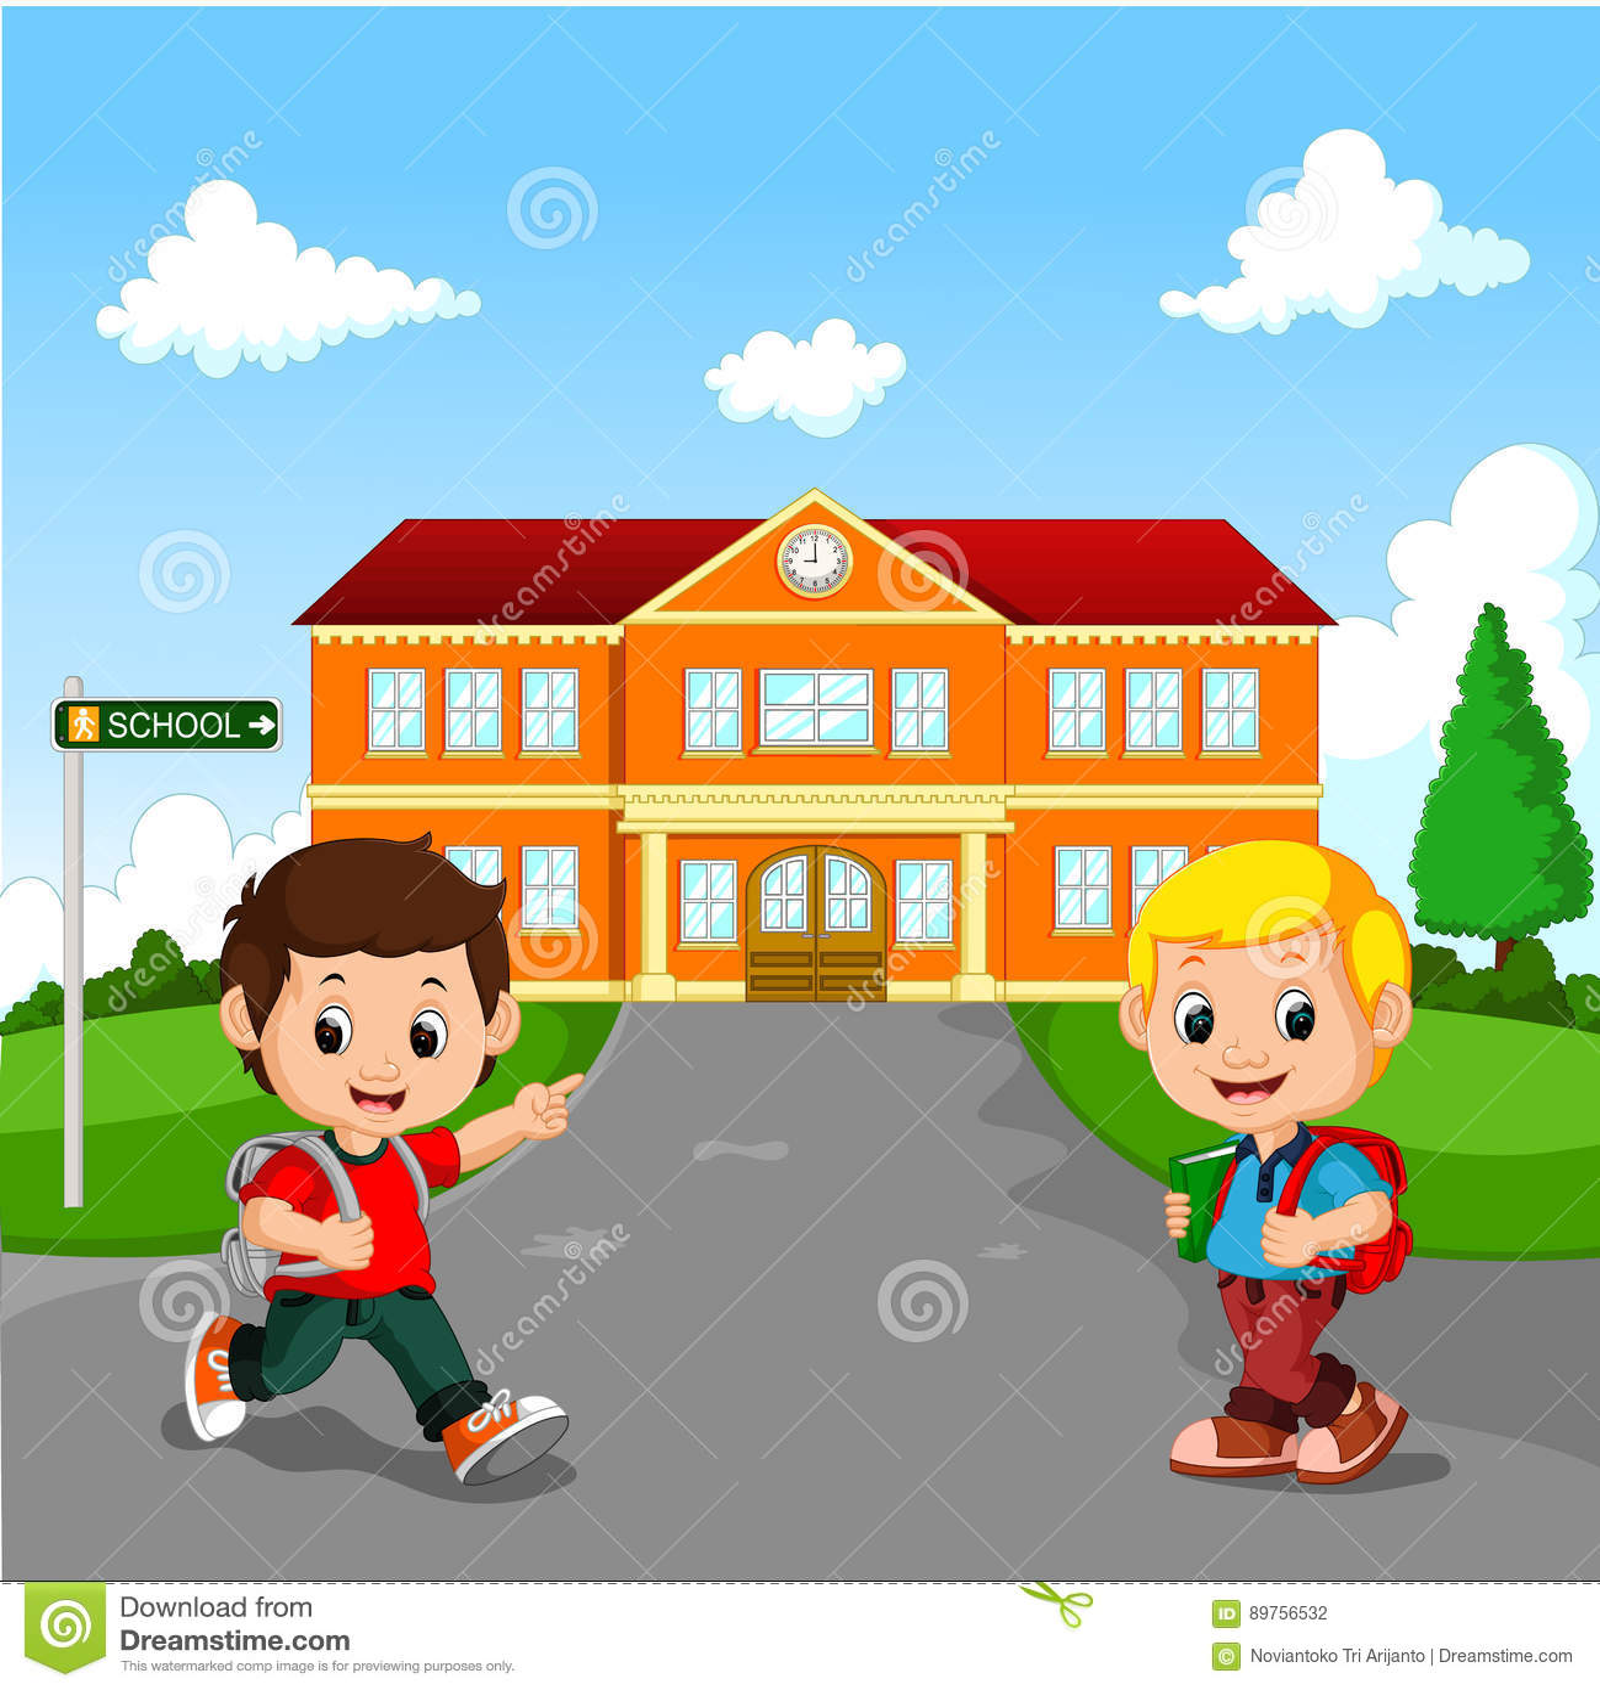 A Boy Going To School Cartoon Cartoon Vector ...